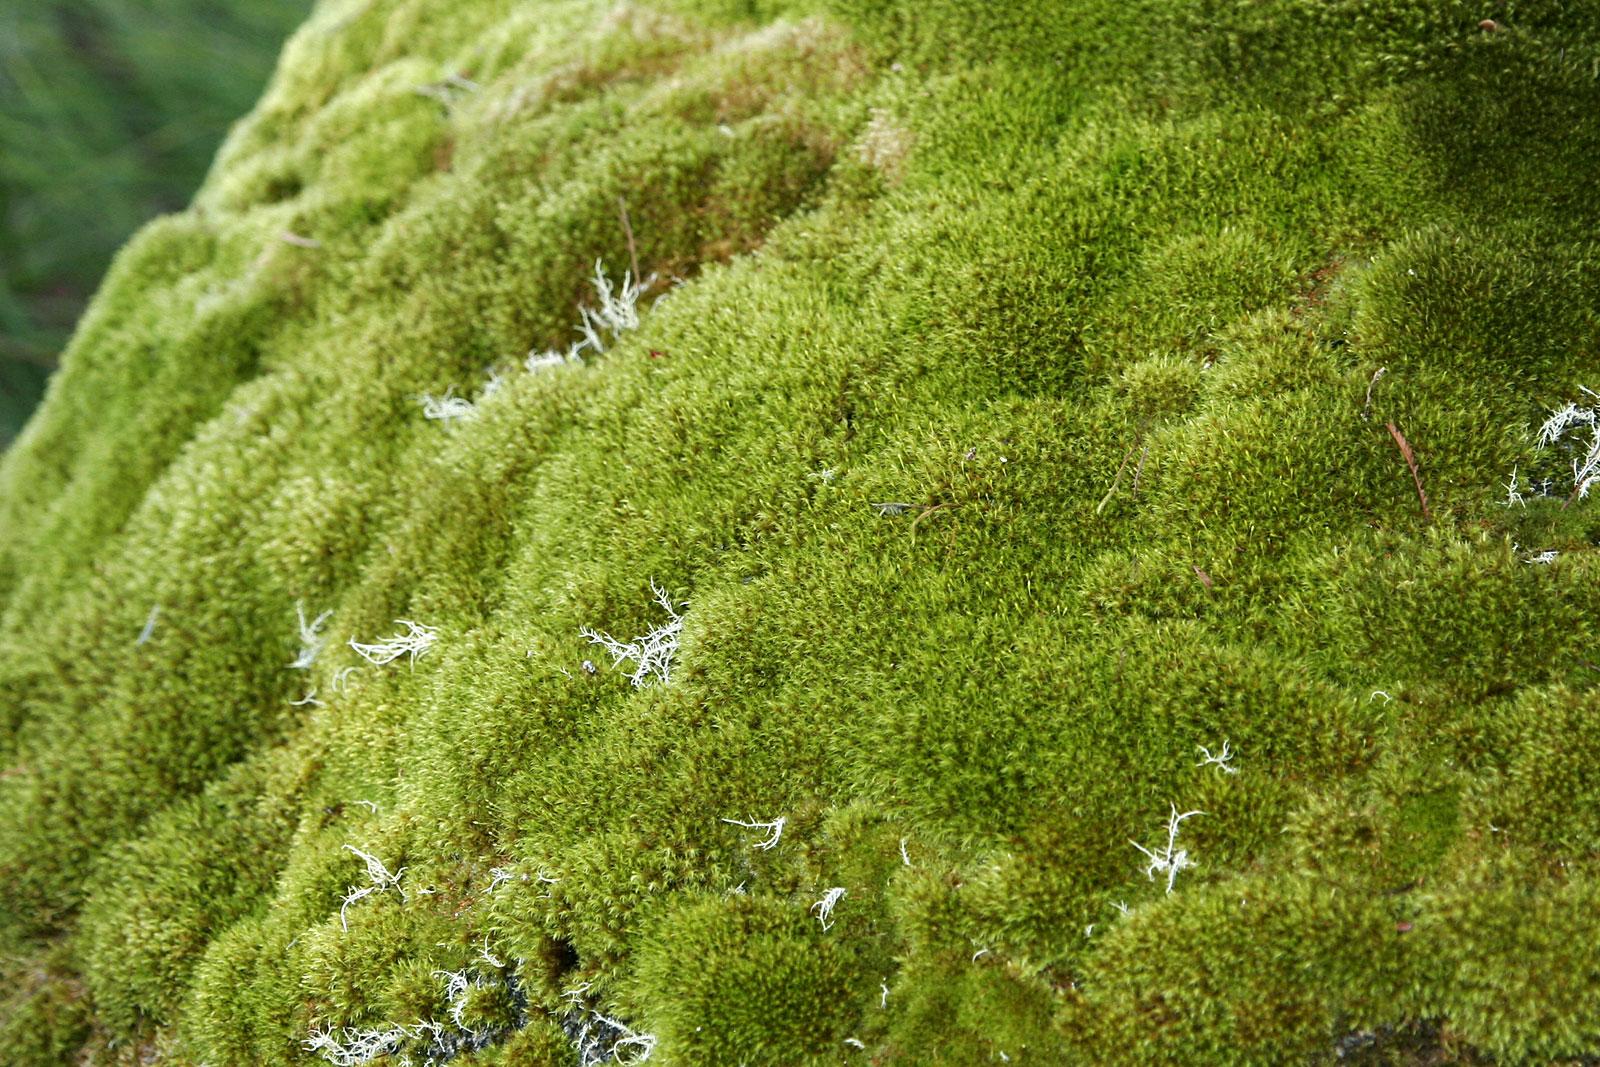 File:Moss.jpg - Wikimedia Commons